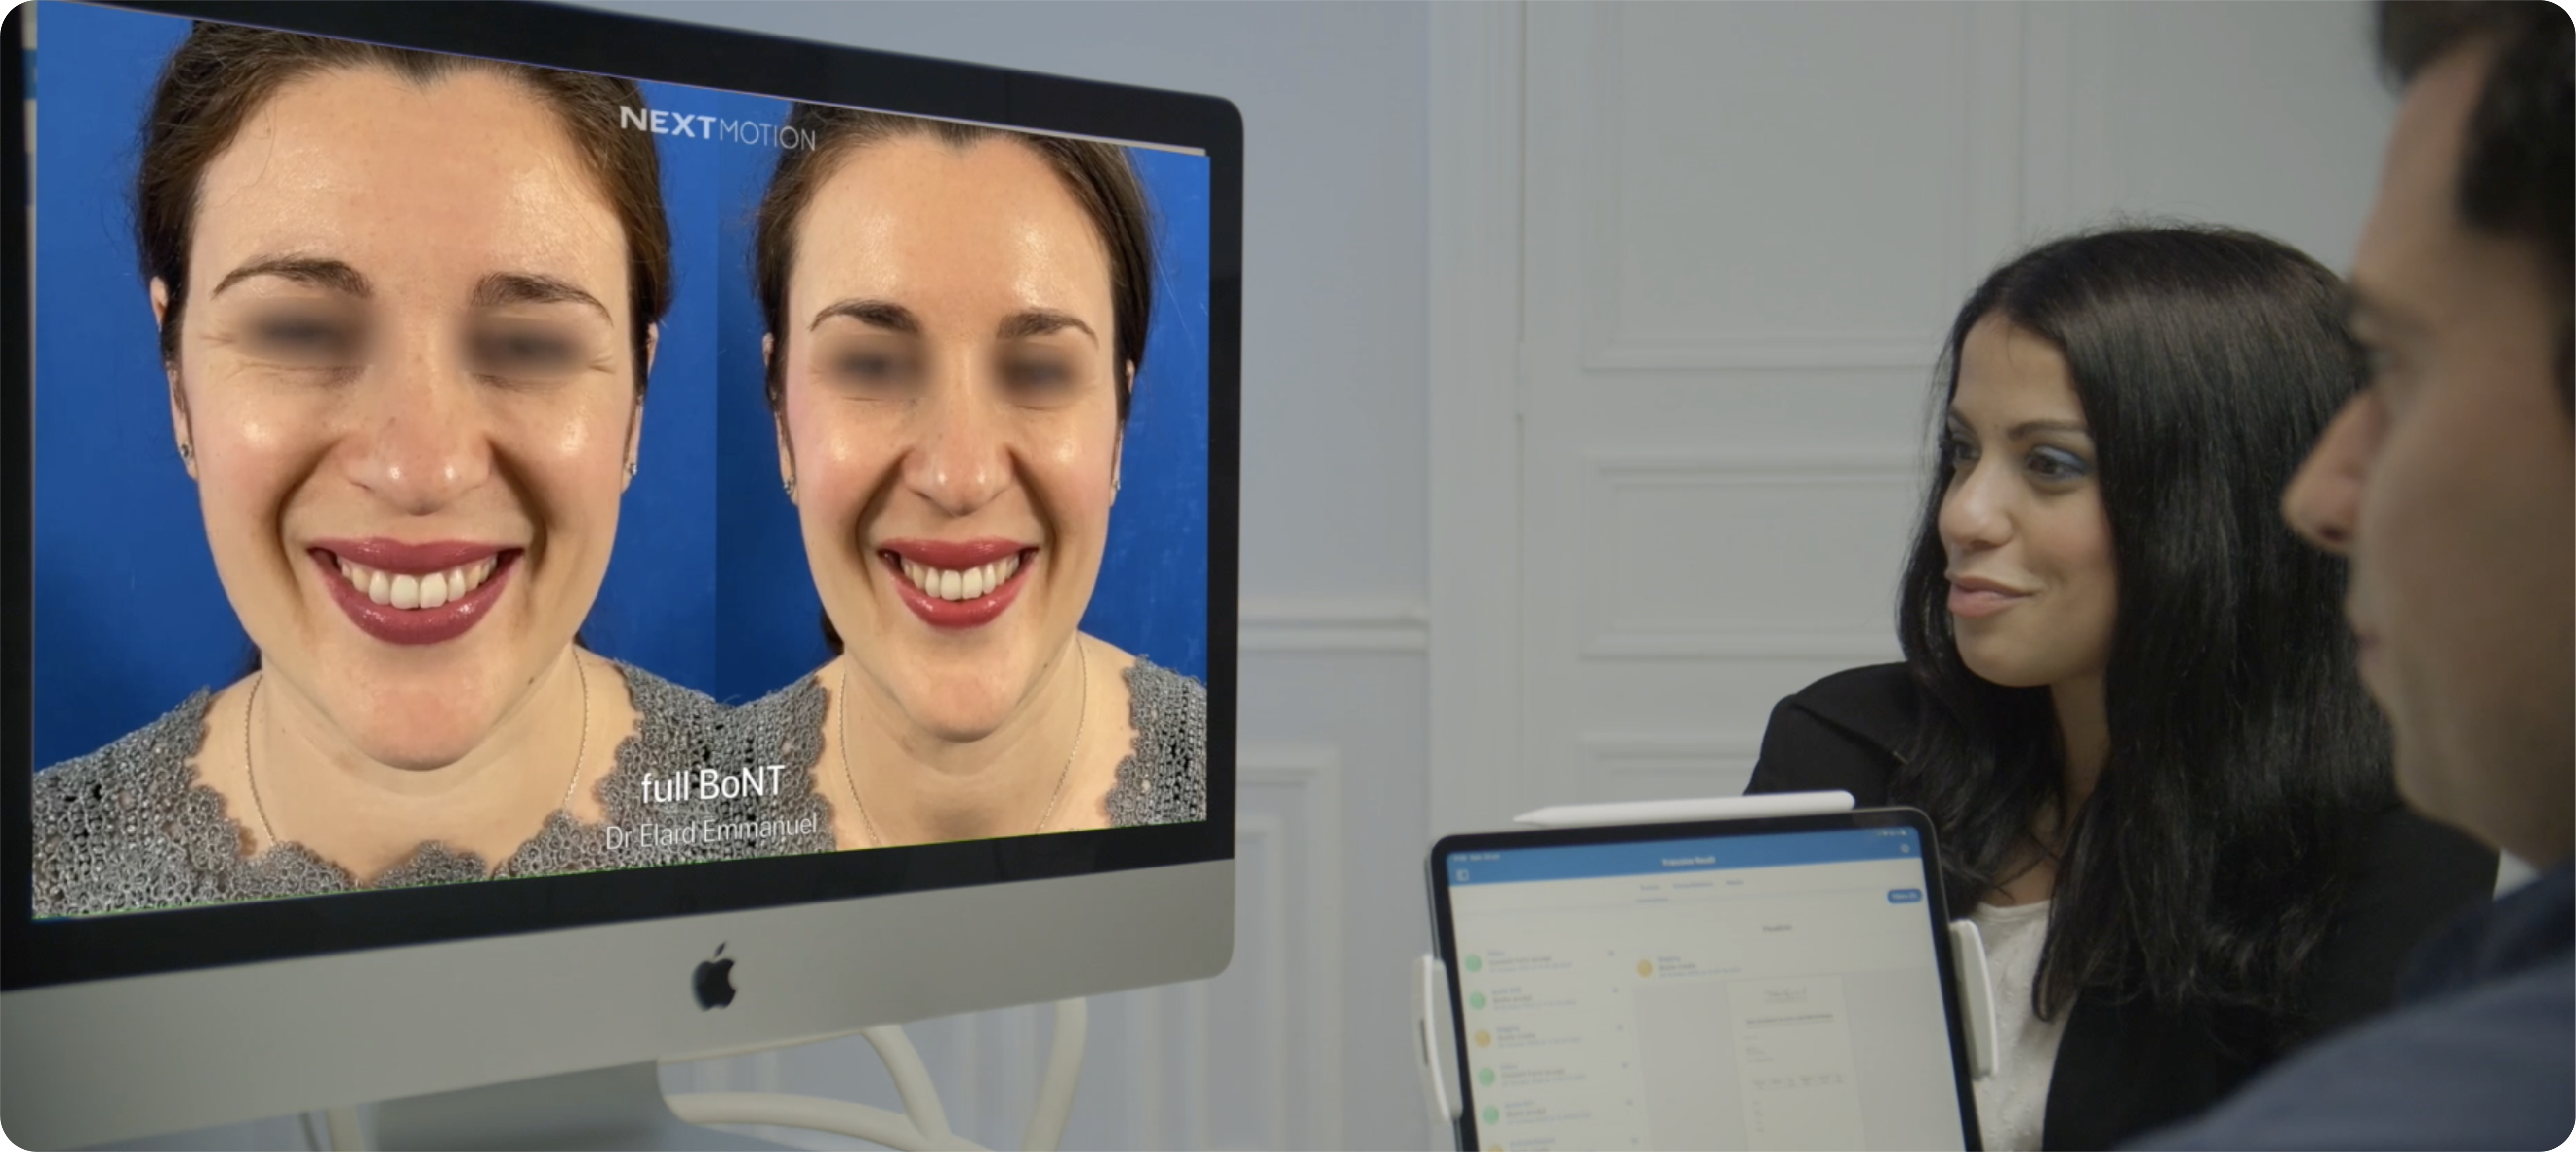 Vidéo présentation produits NextMotion